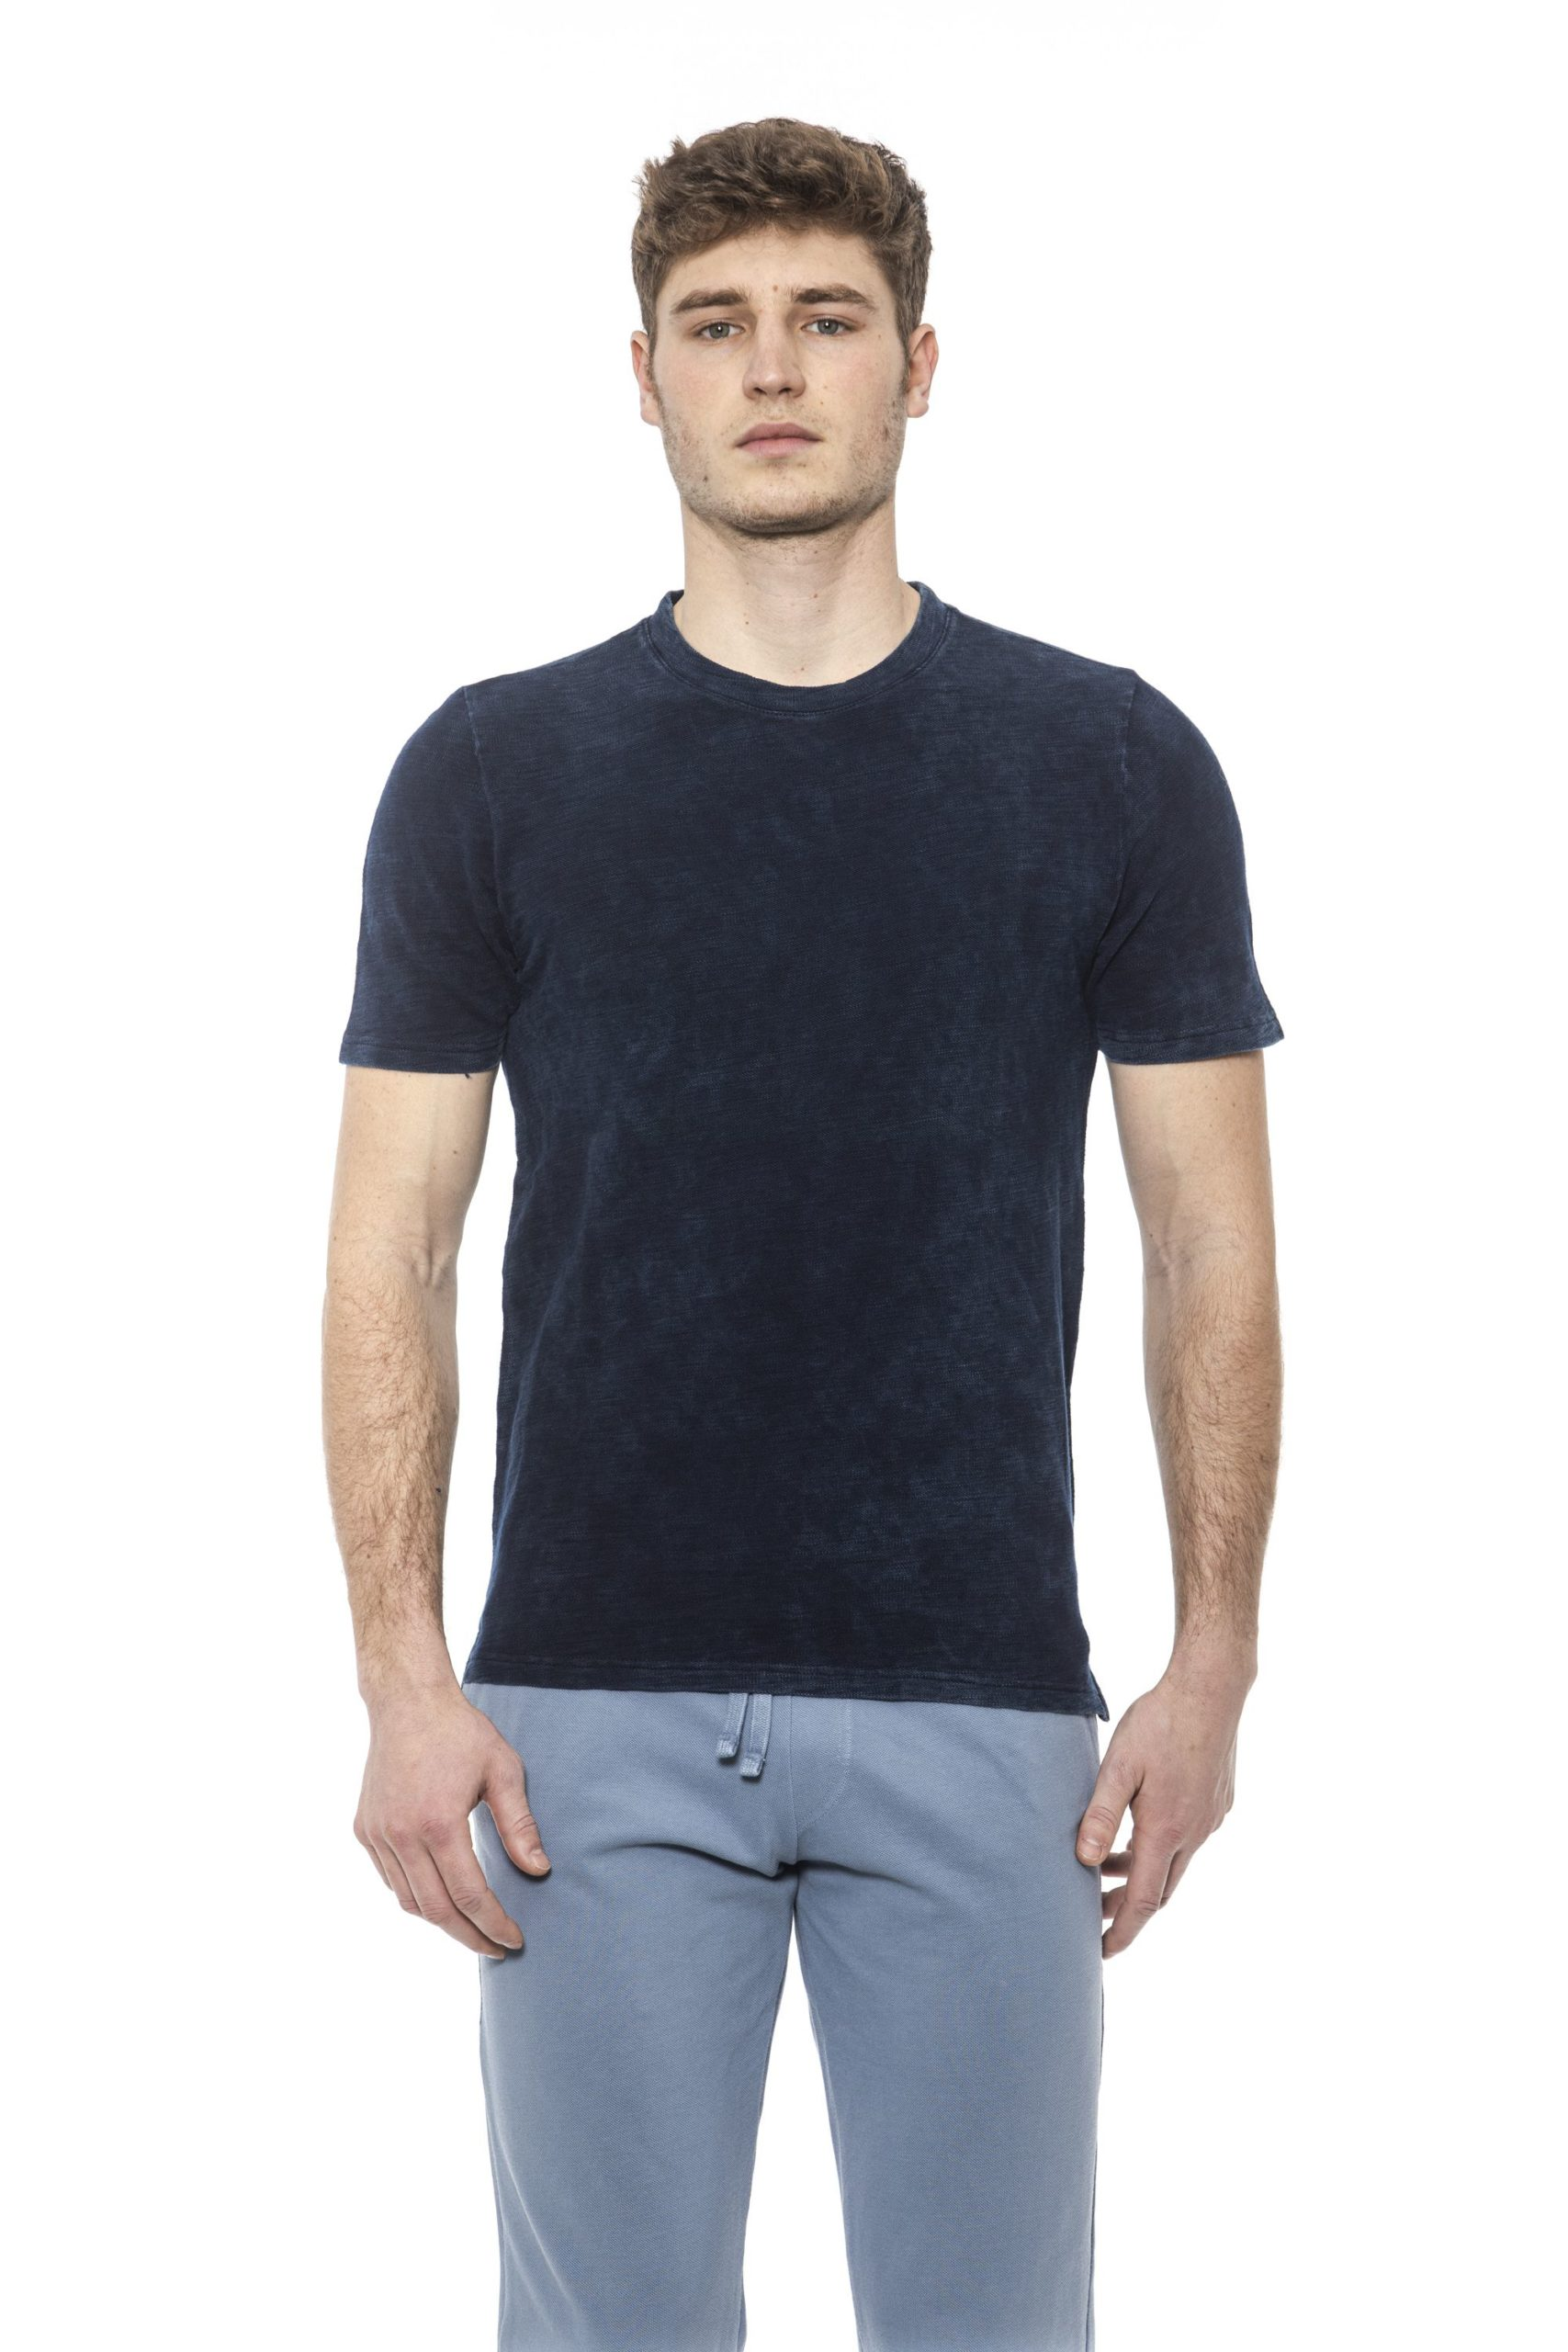 Alpha Studio Men's V A R. U N I C A T-Shirt Light Blue AL1374642 - IT48 | M